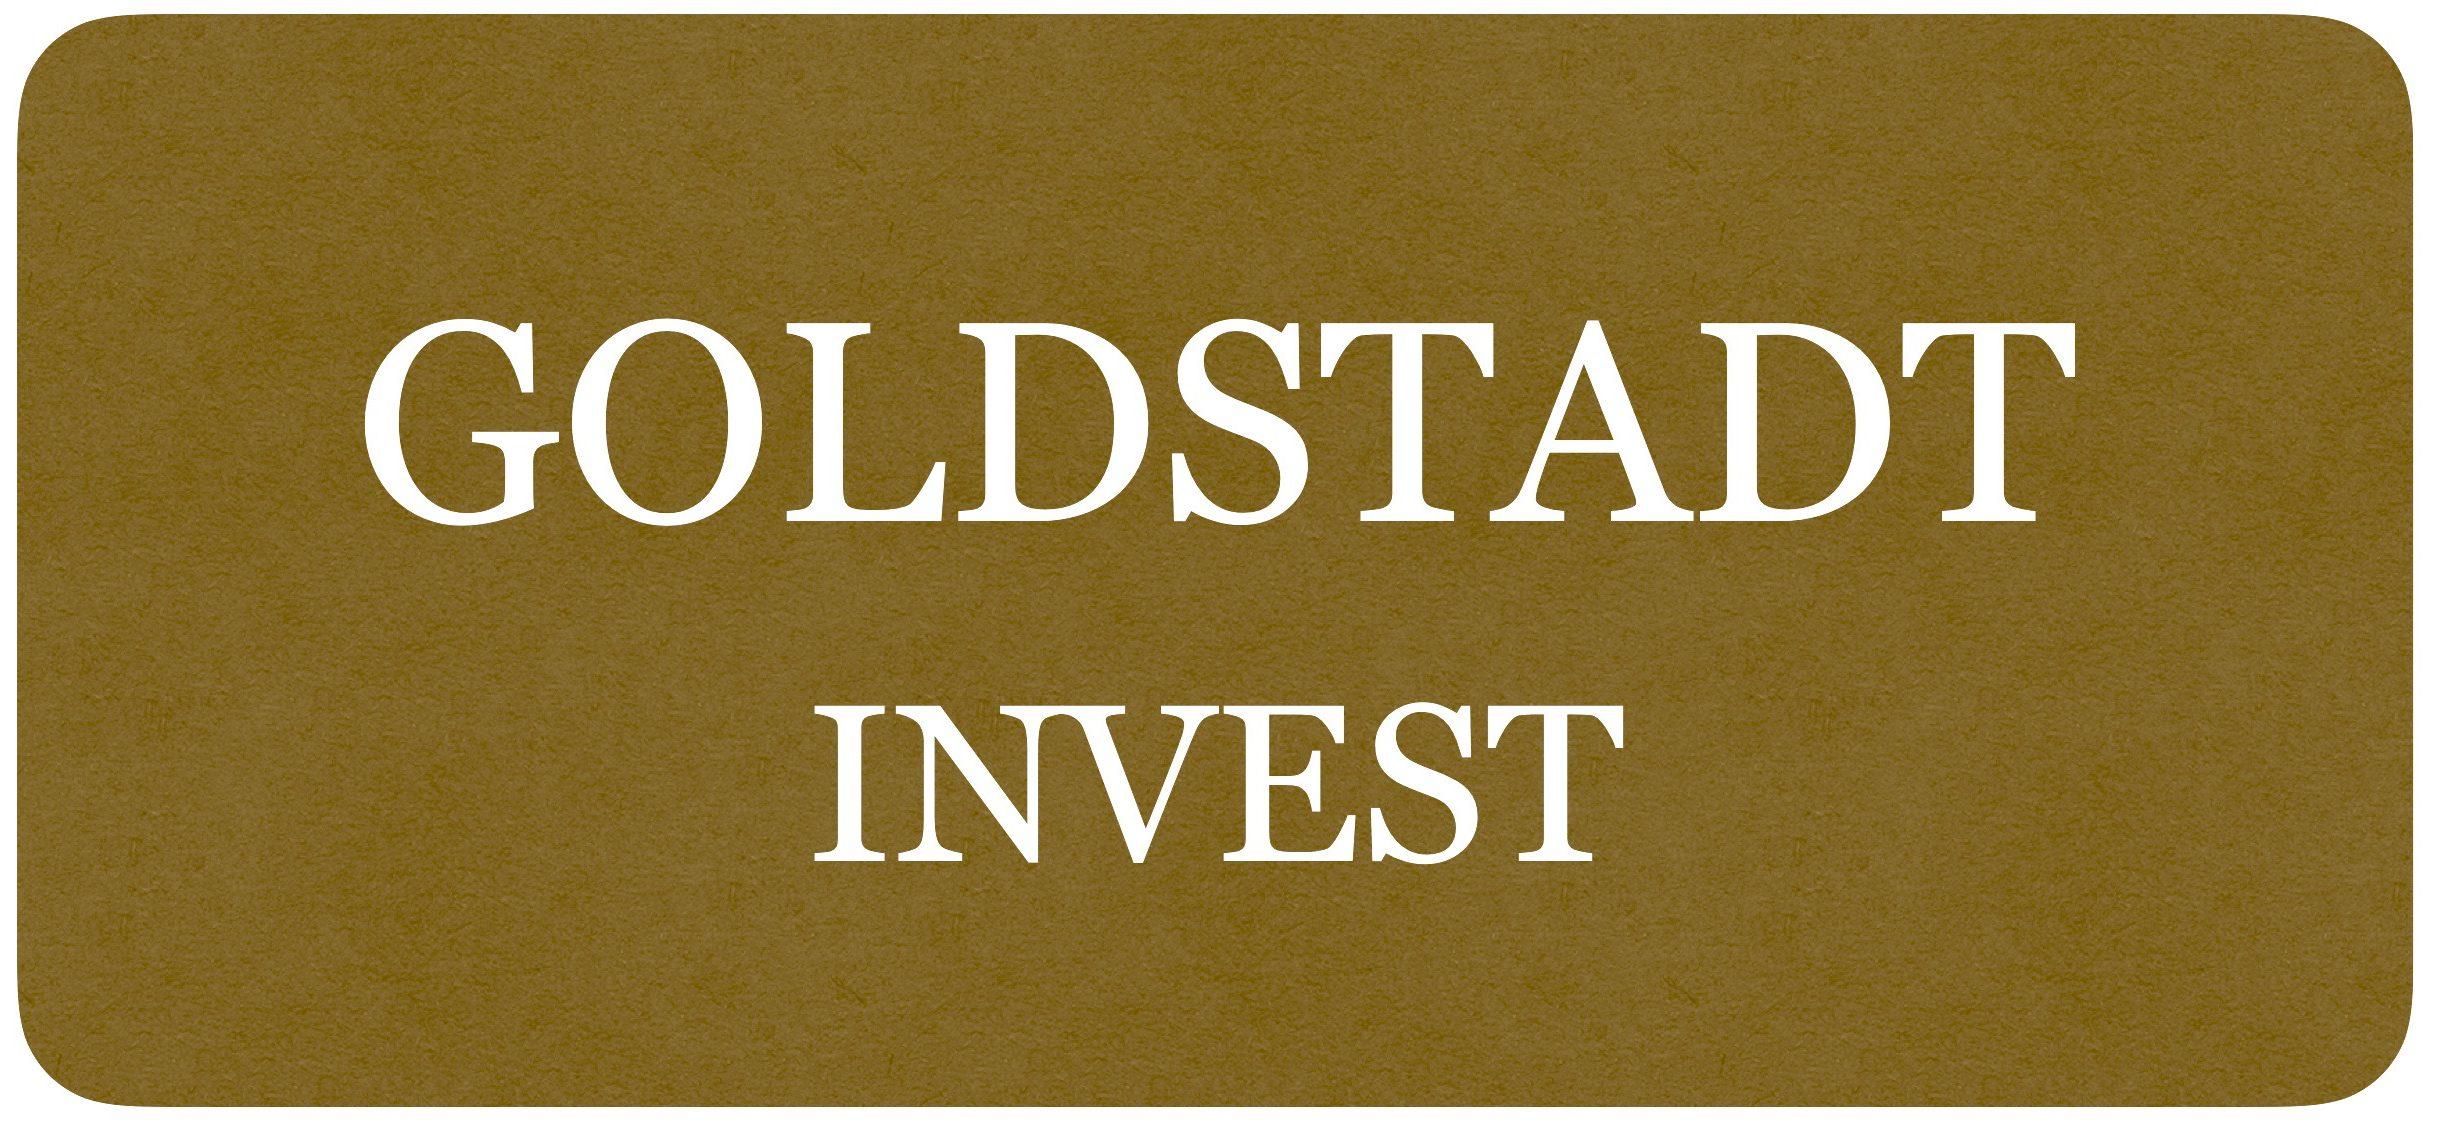 Goldstadt Invest GmbH — Приобретение недвижимости и развитие проекта Пфорцхайм Штутгарт